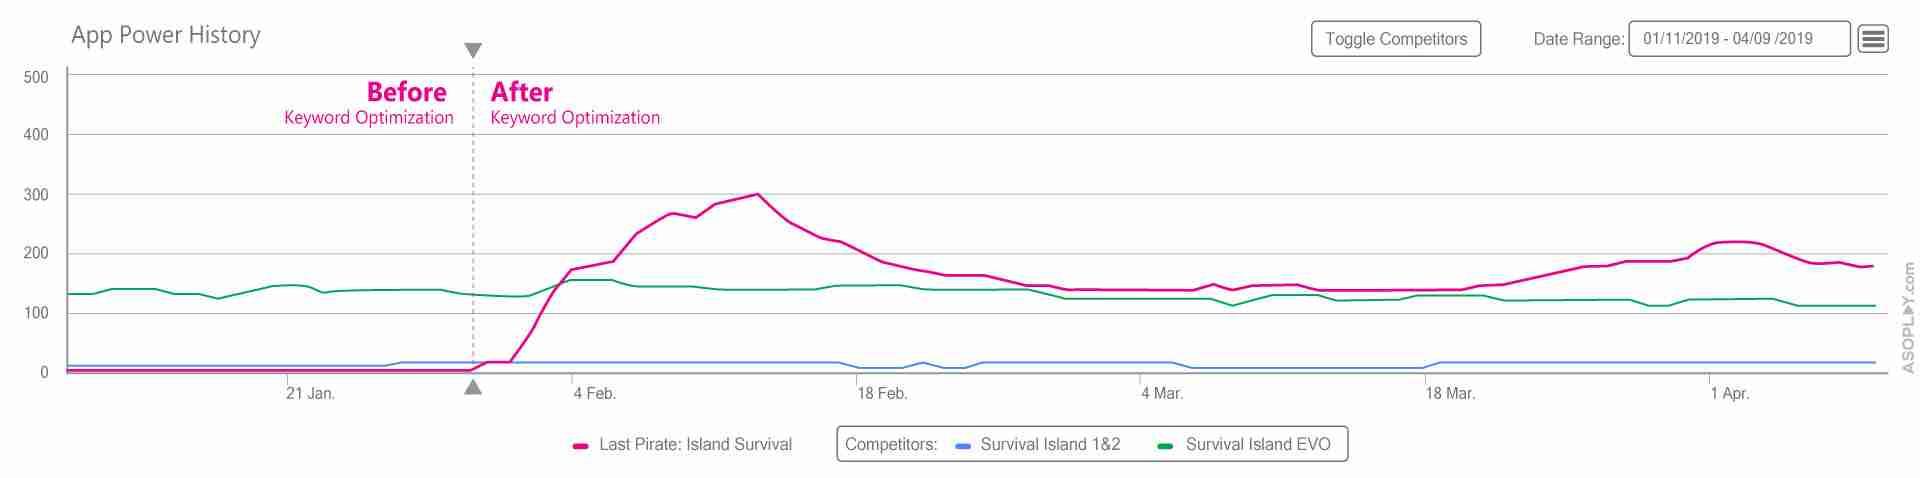 App Power History Keyword Optimization Competitors